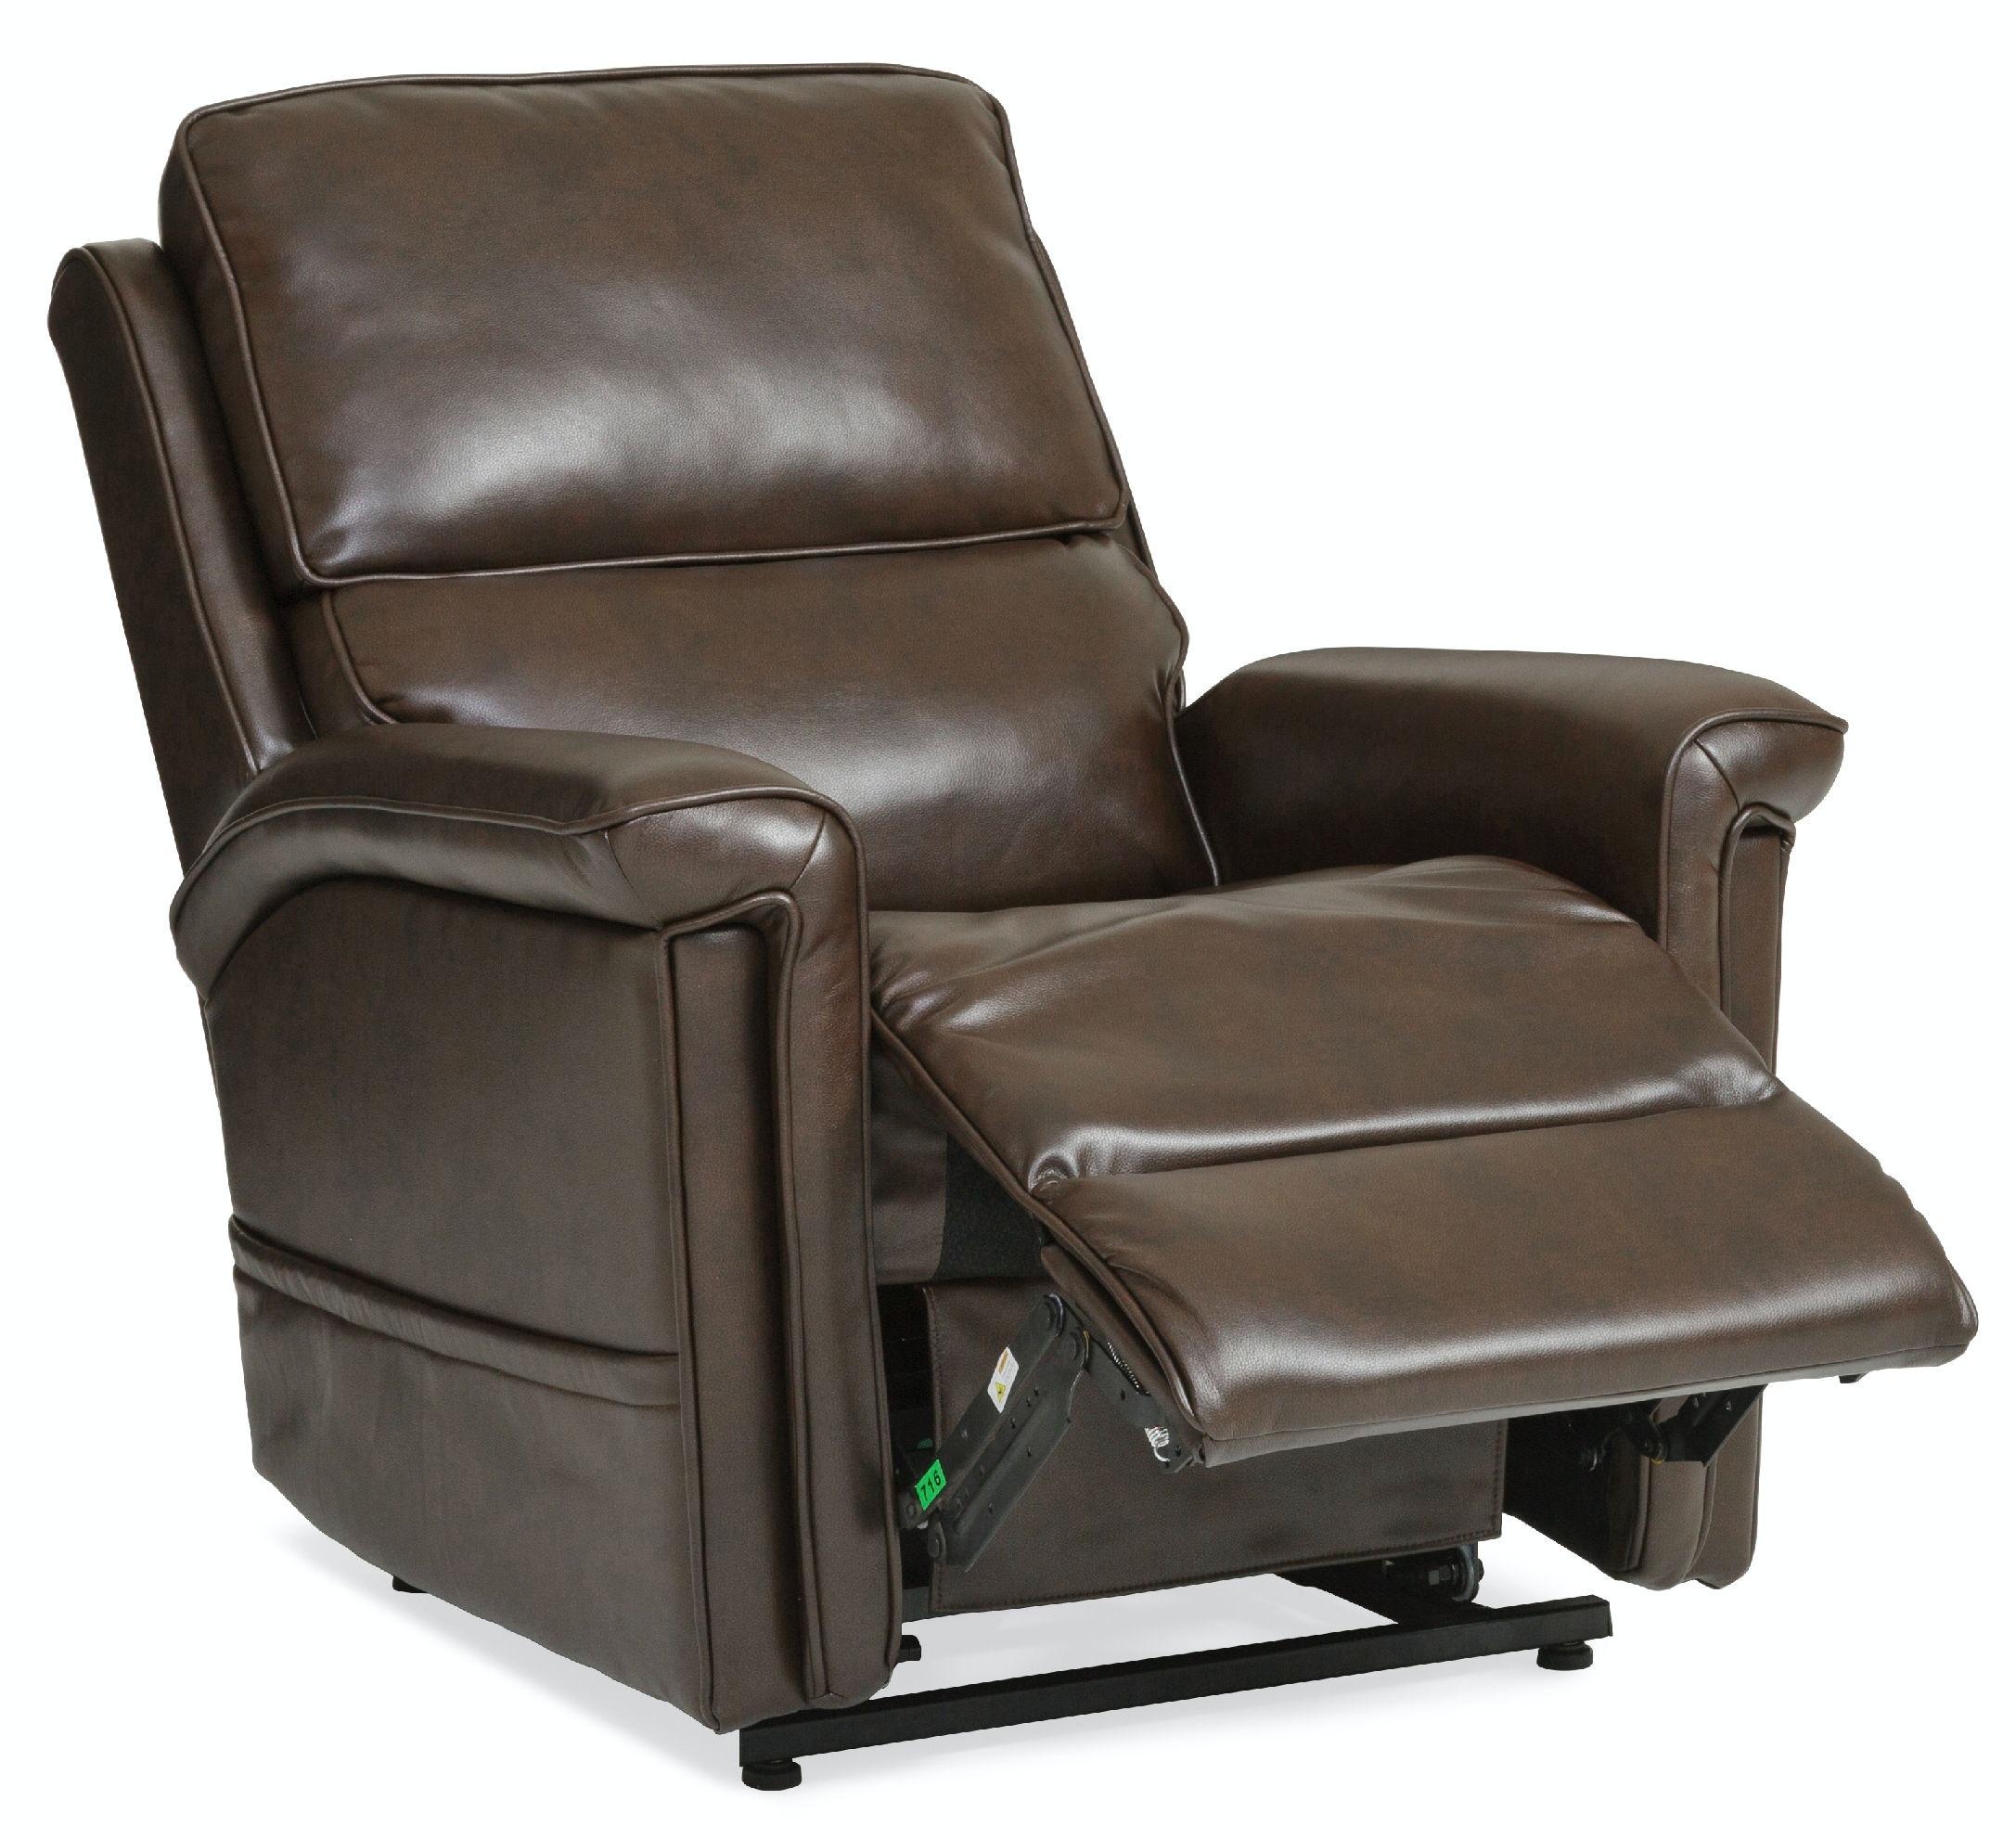 pride lift chairs nichols and stone new rtty1